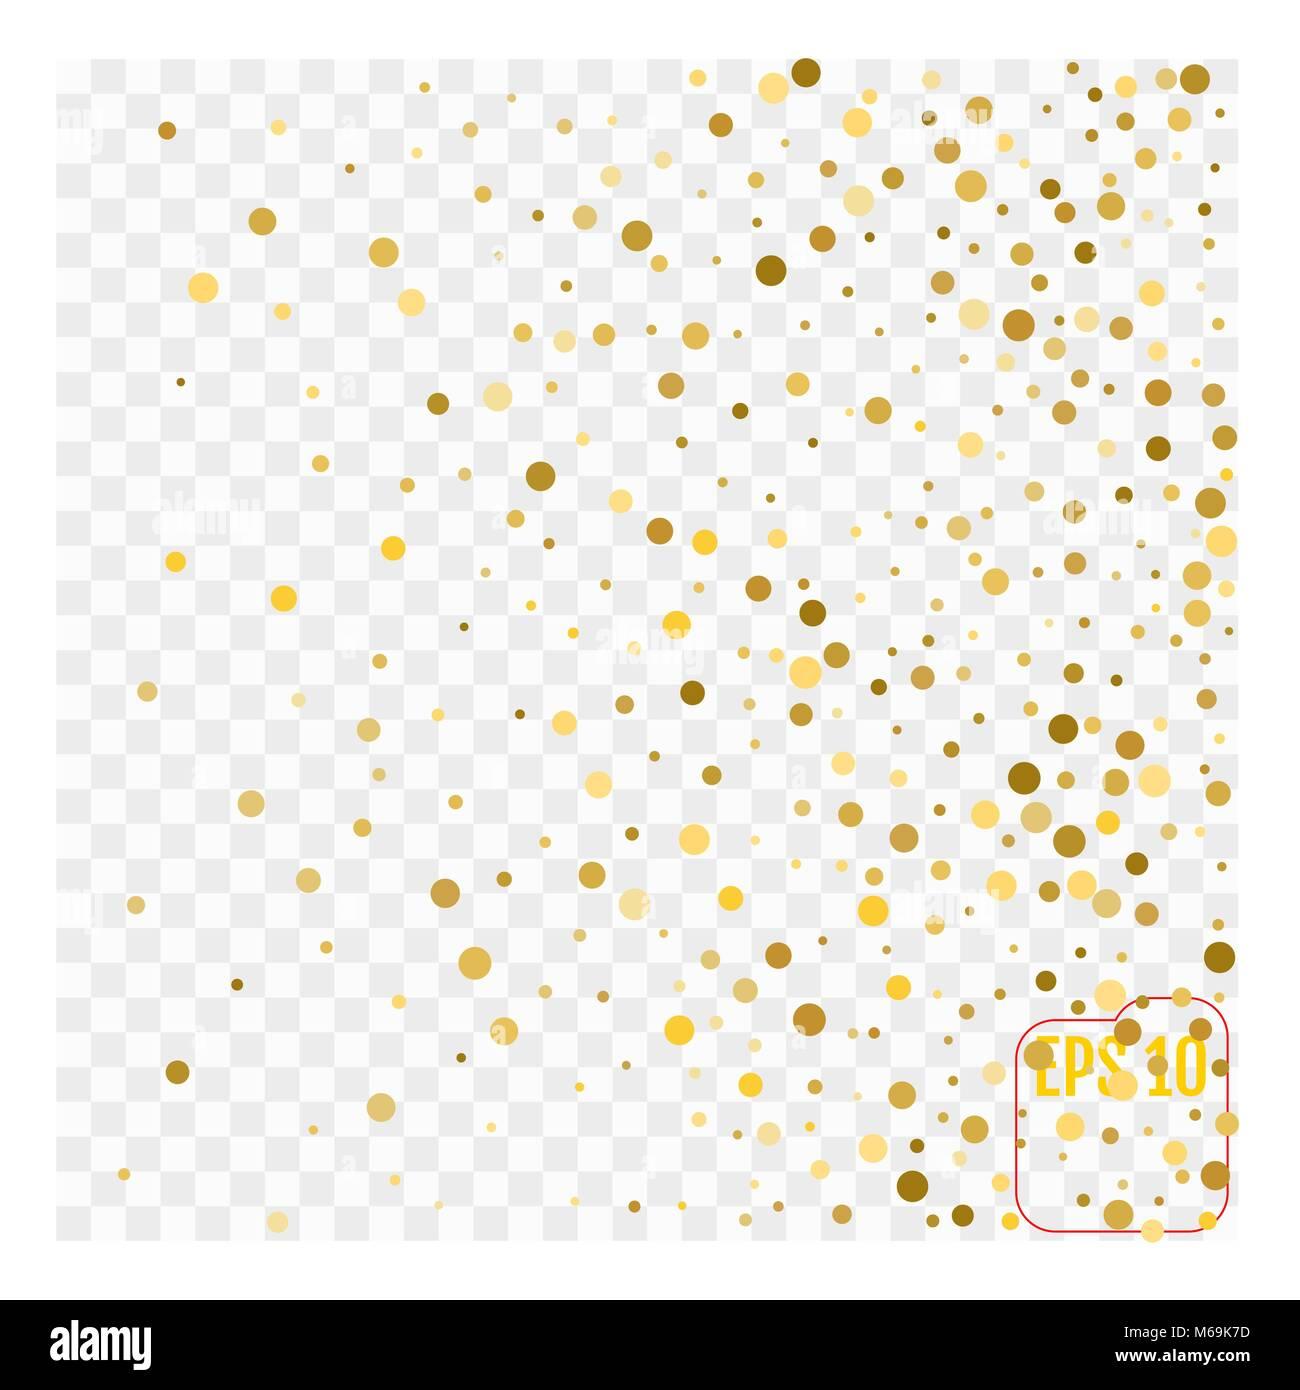 217f0bd1231 Gold glitter corners for frame or border